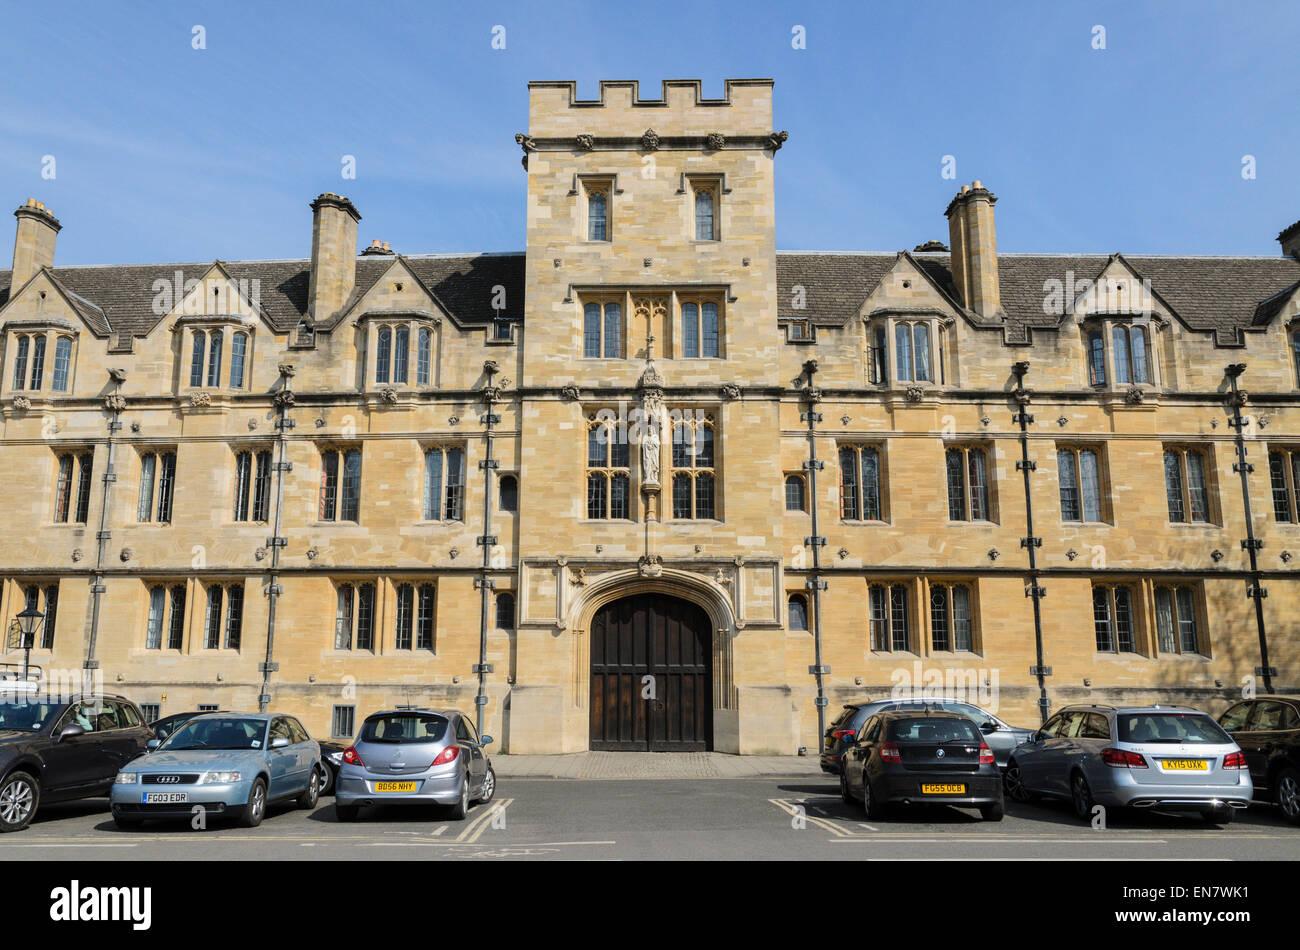 St Johns College, University of Oxford, Oxford, U.K. - Stock Image